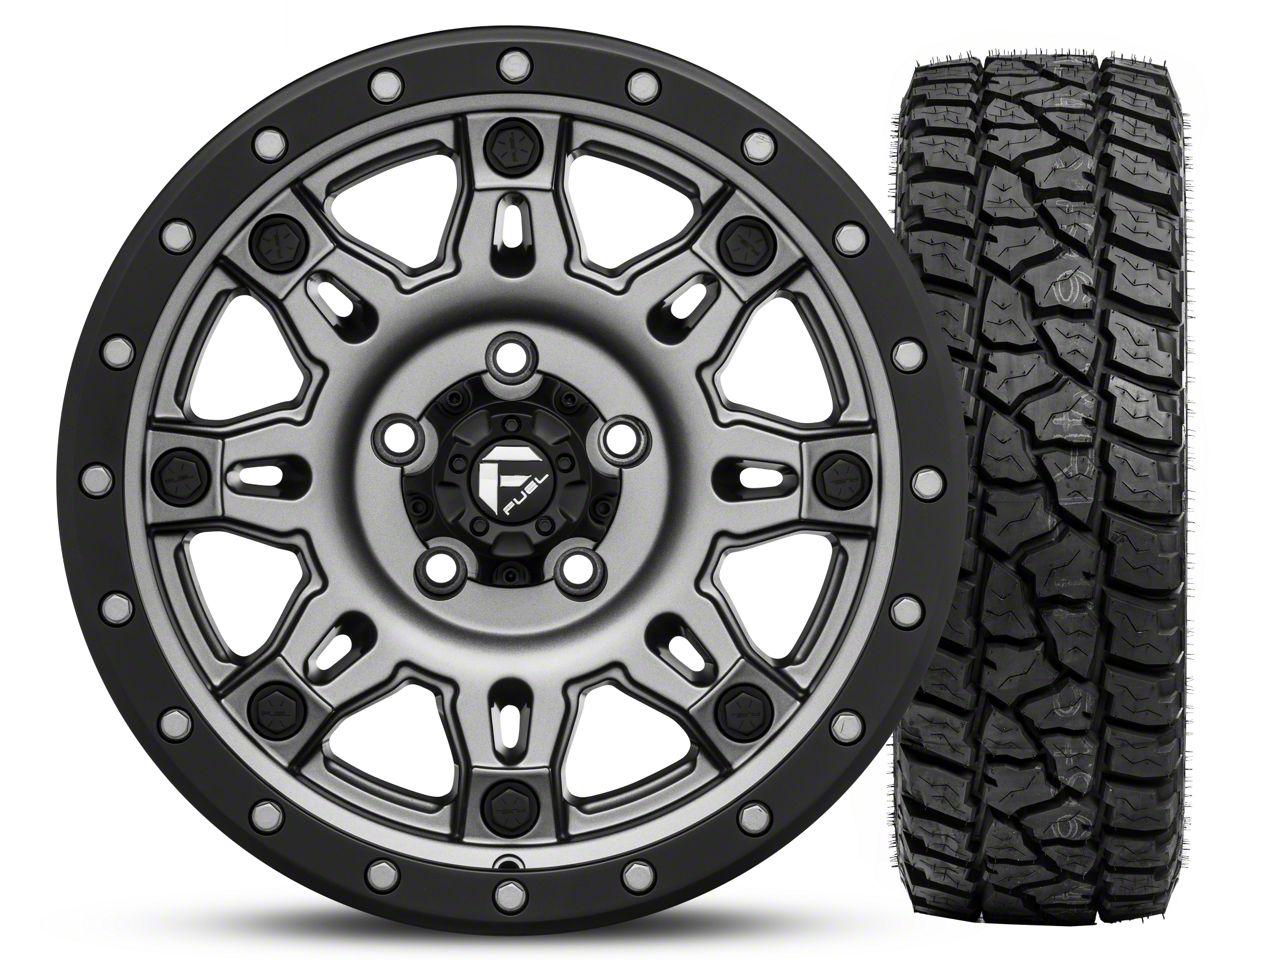 Fuel Wheels Hostage III Gunmetal and Black Wheel 17x9 and Mickey Thompson Baja ATZP3 LT265/70R17 Kit (07-18 Jeep Wrangler JK)